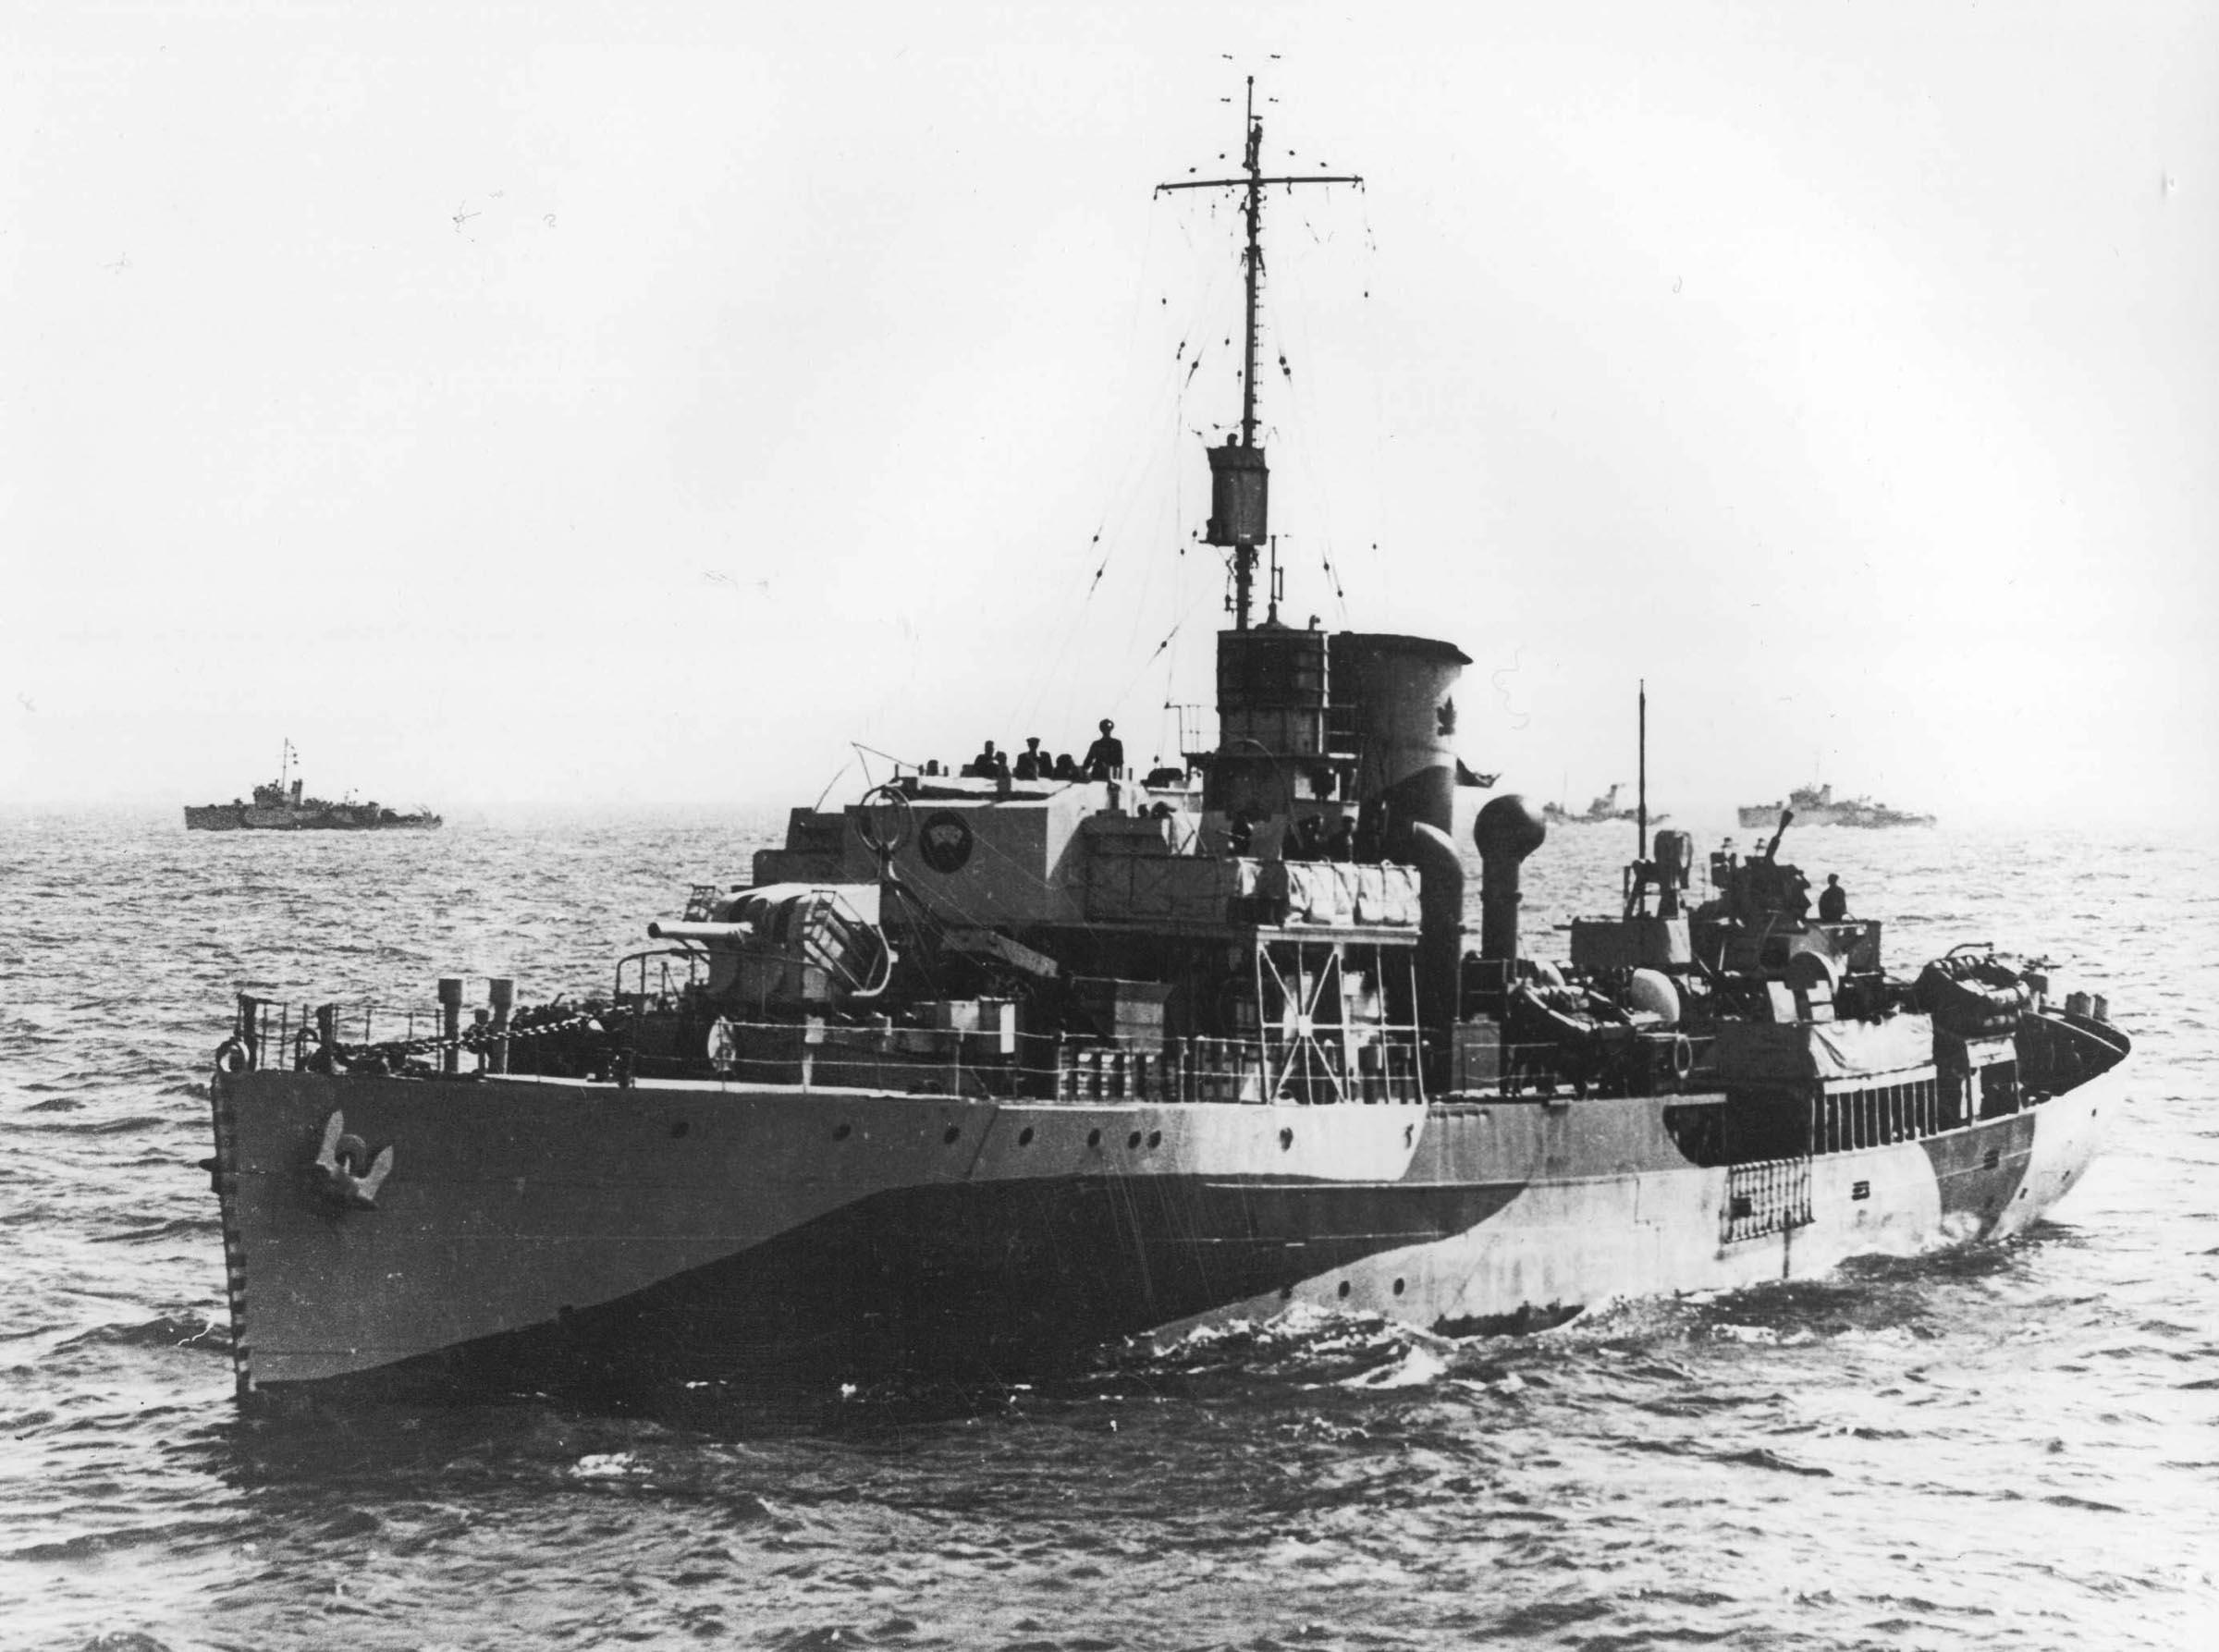 HMCS BADDECK